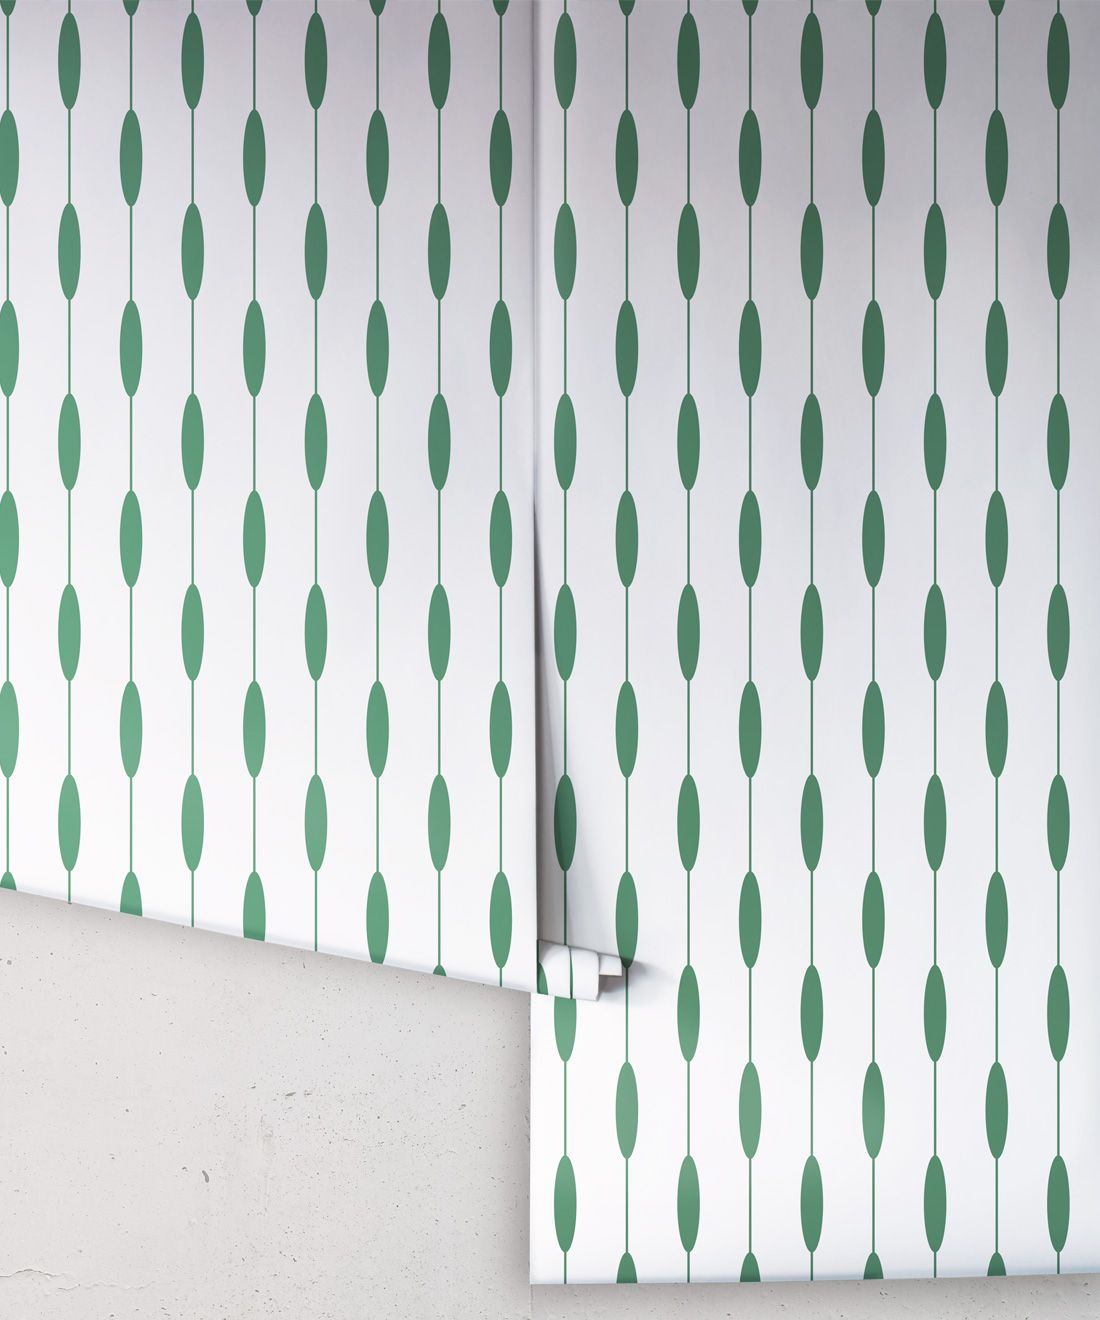 Bowline Wallpaper • Geometric Wallpaper • Striped Wallpaper • Green Wallpaper •Rolls